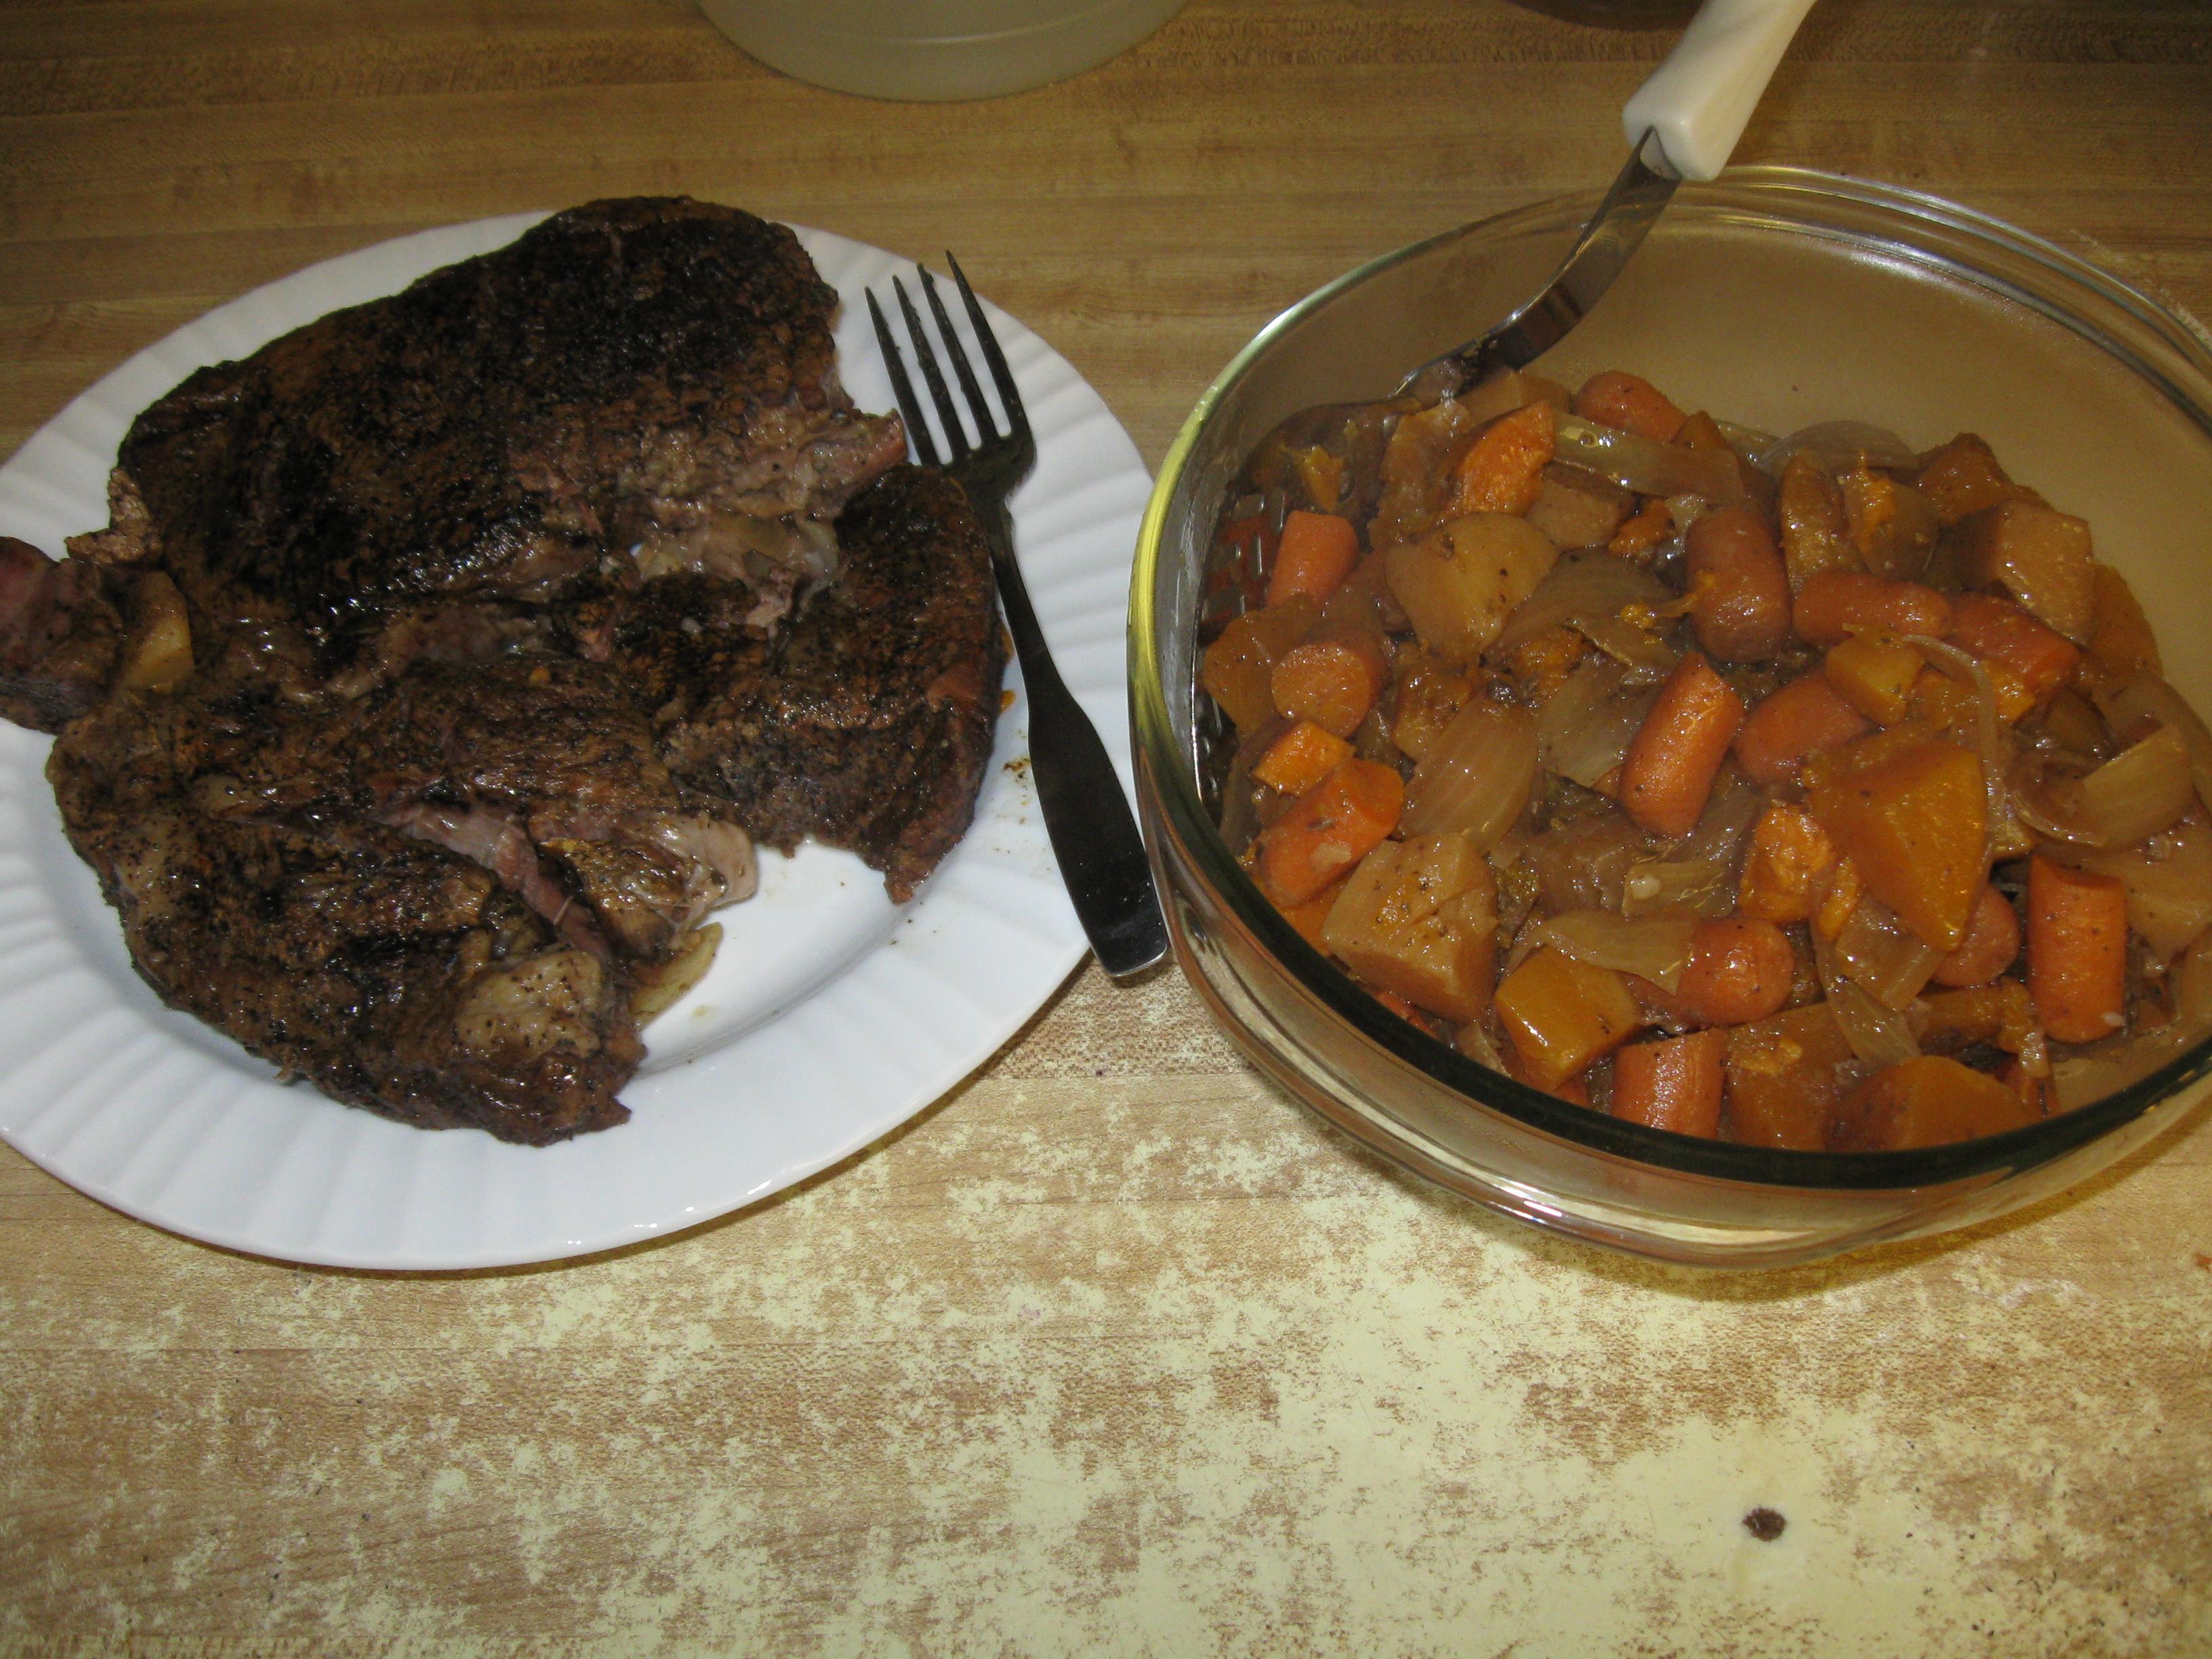 Slow Cooker Pot Roast and Veggies